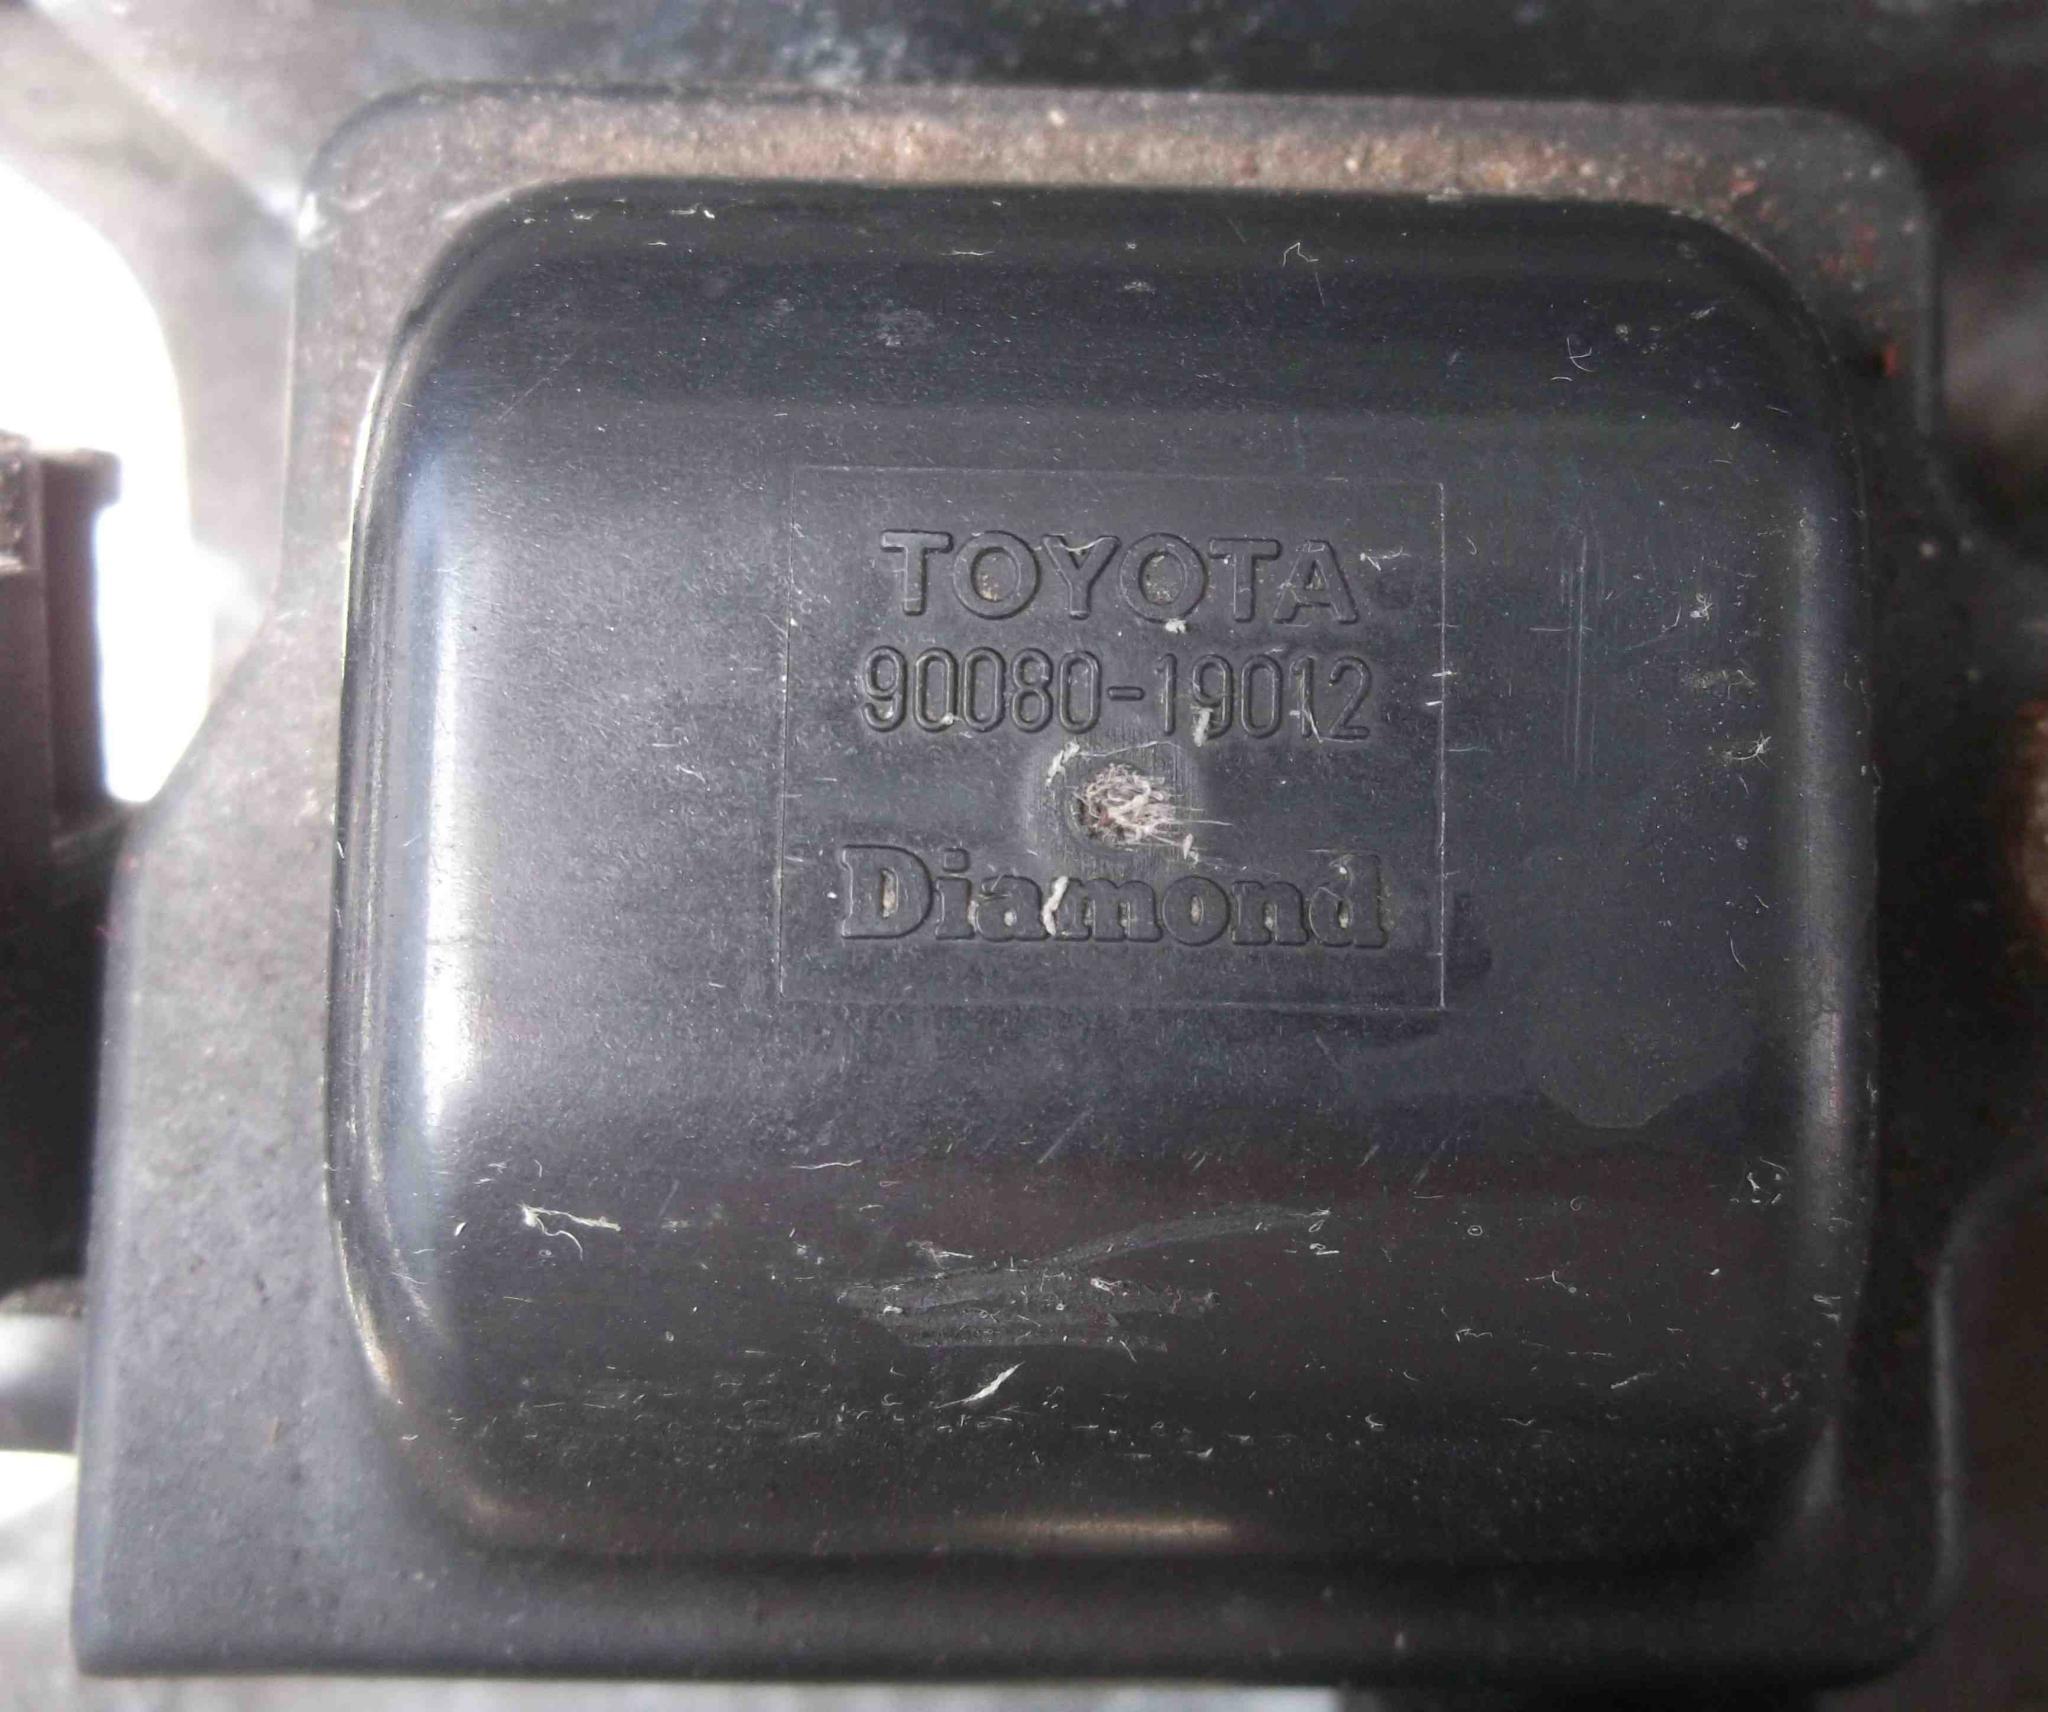 toyota sienna firing order Toyota Tundra Fuse Box Diagram Toyota 4Runner Fuse Box Diagram